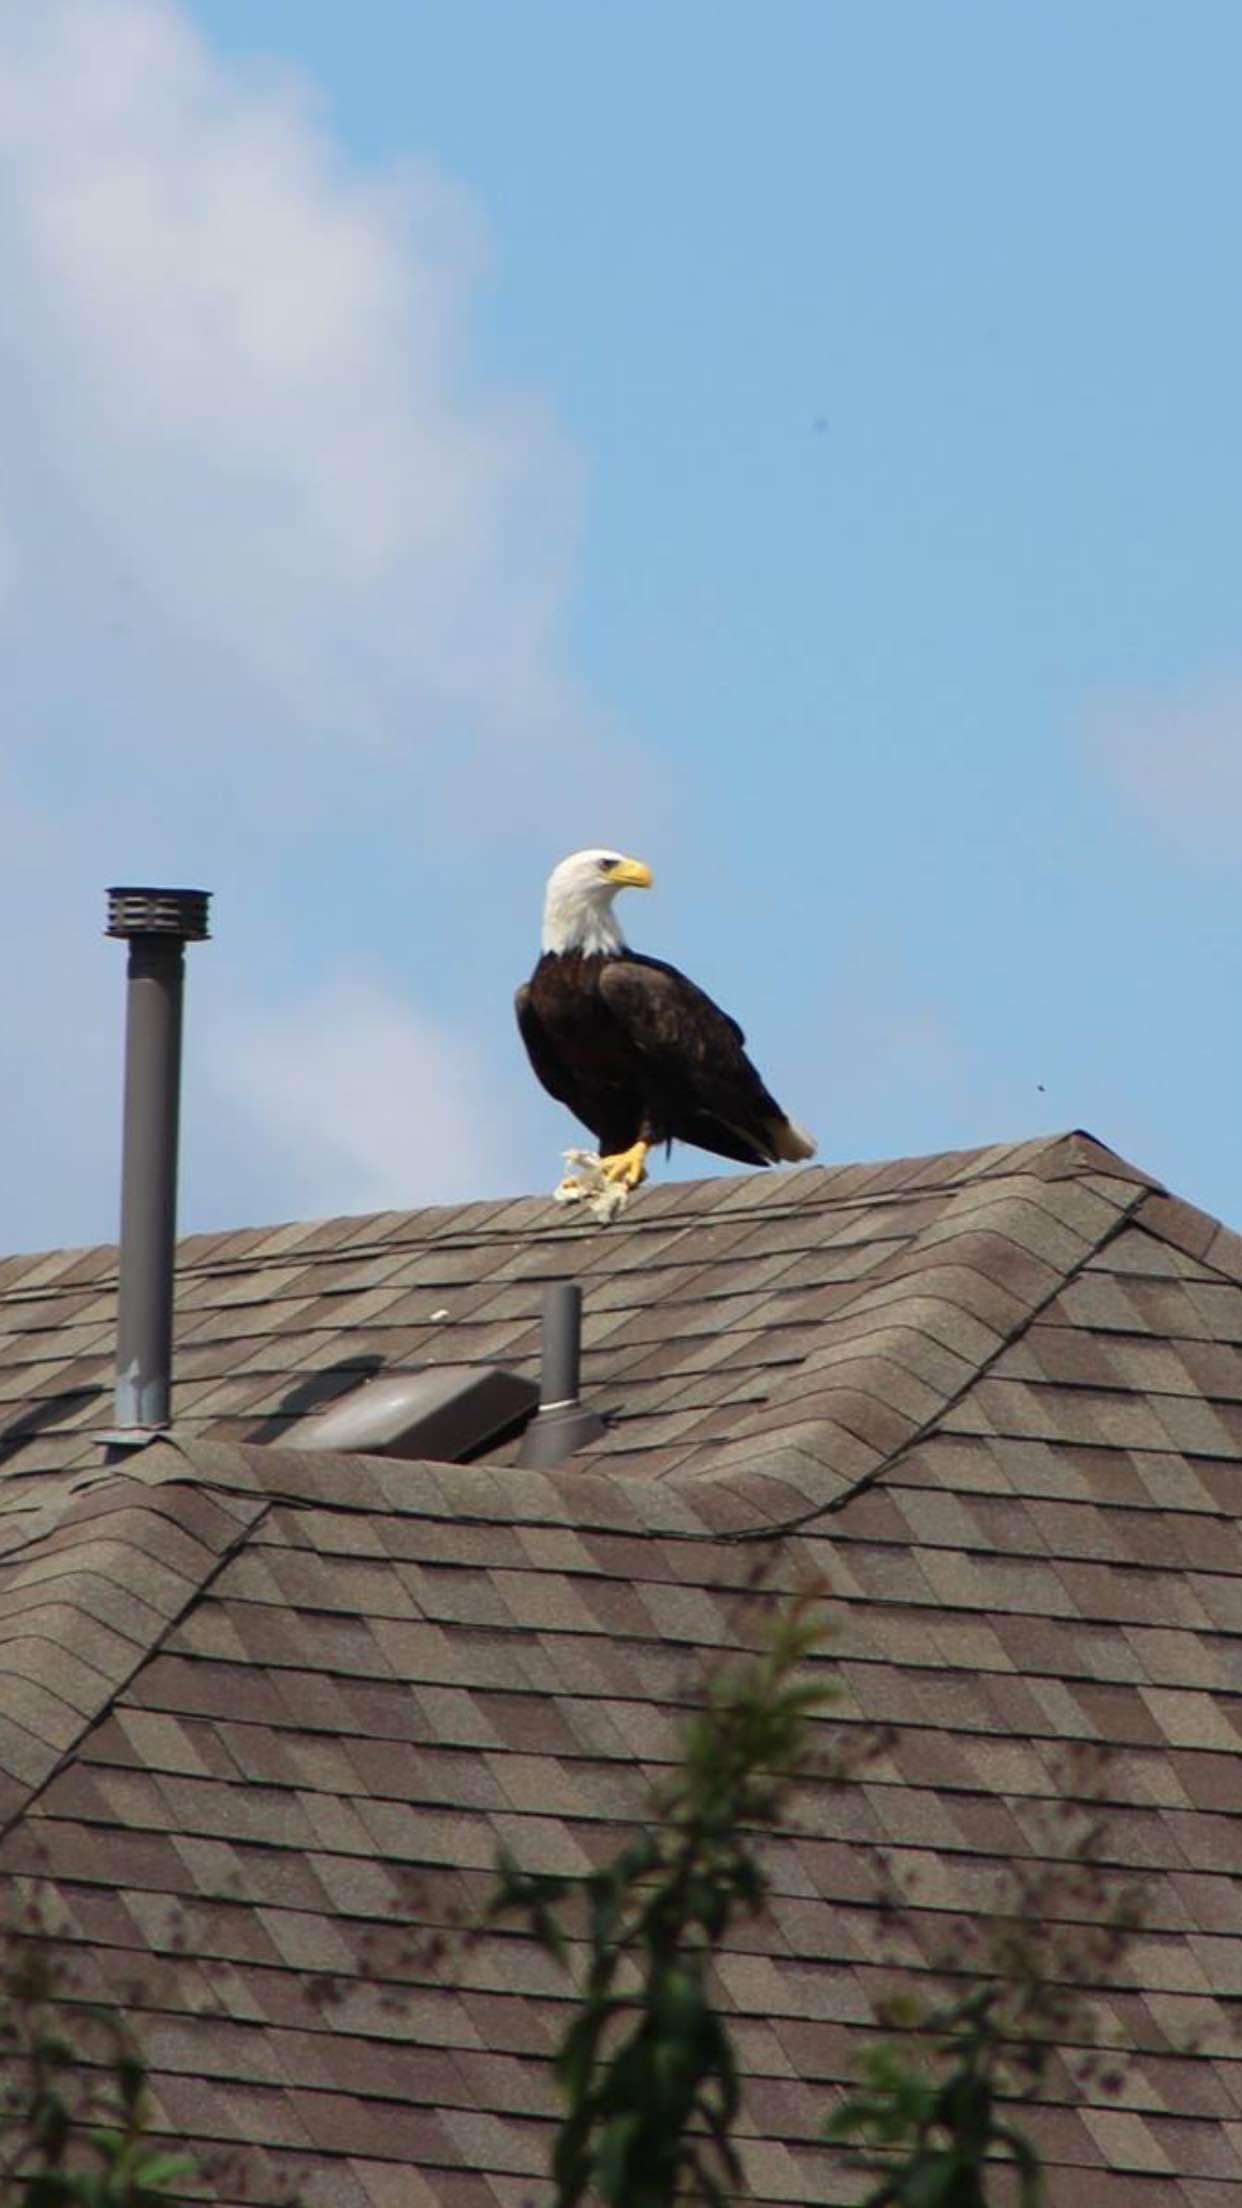 Bald eagle in Texas